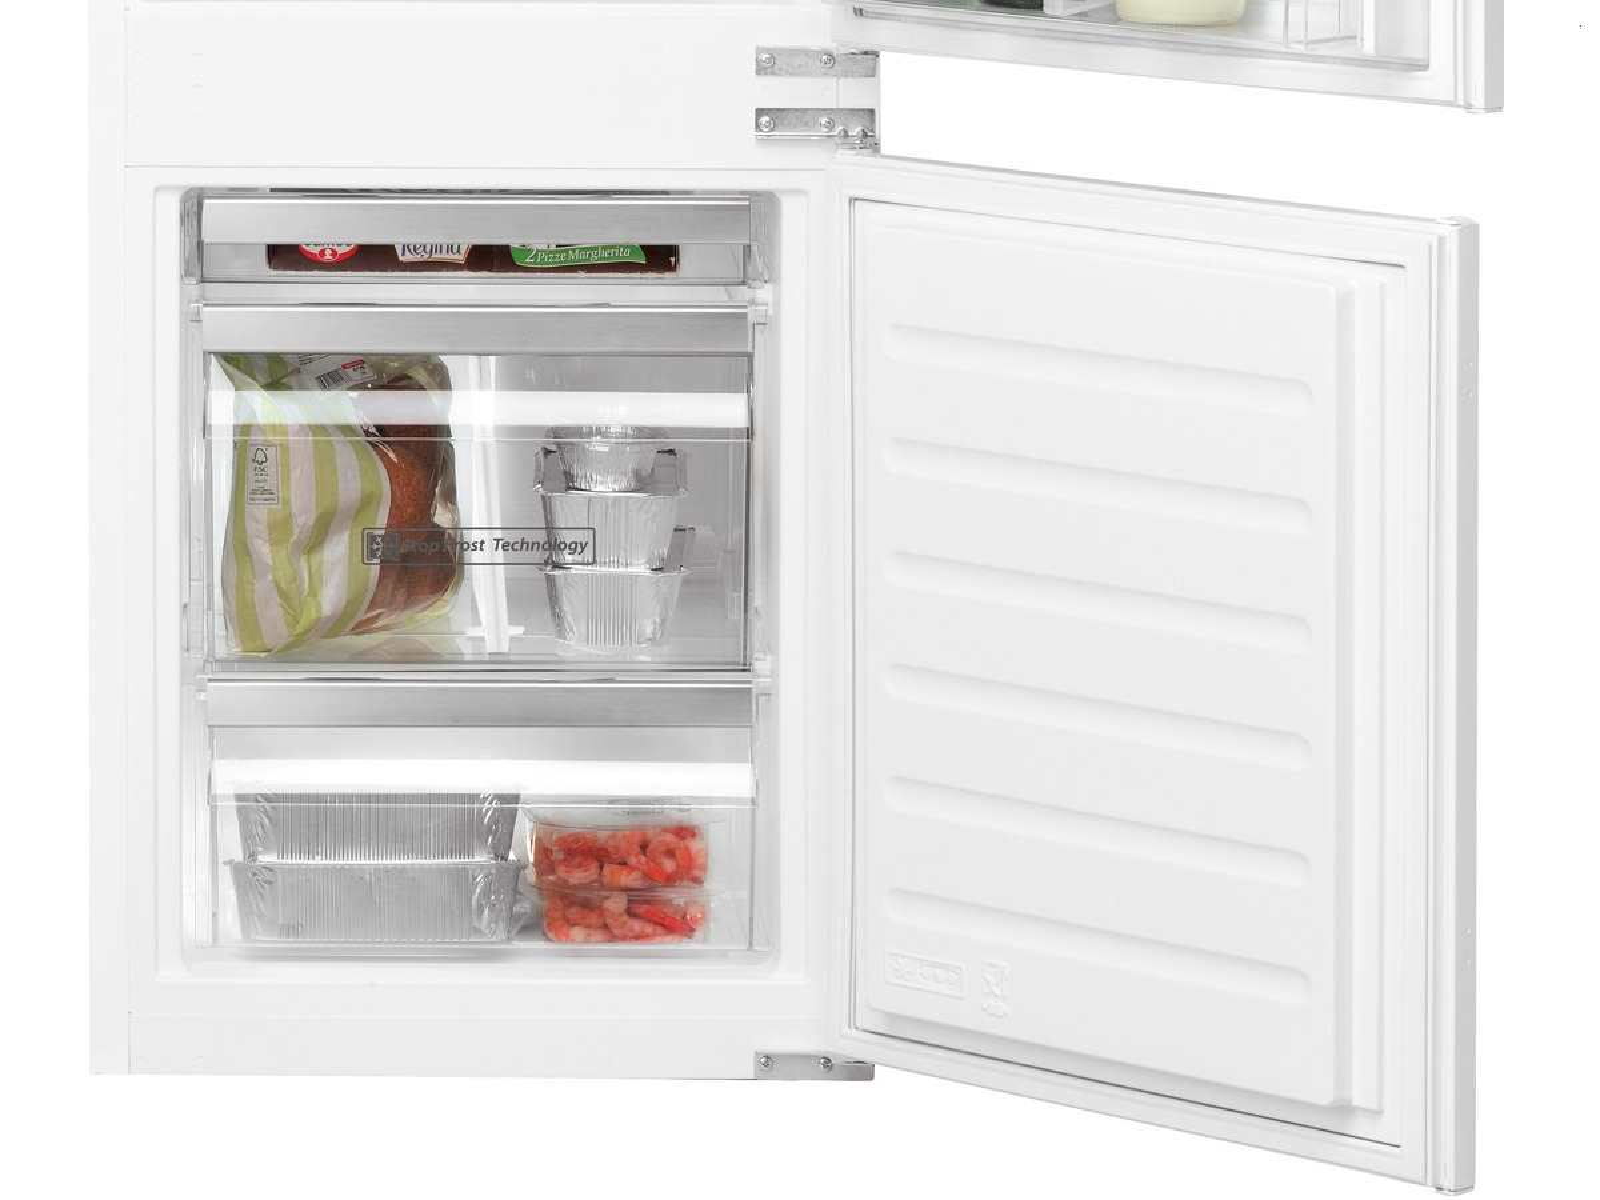 Kühlschrank Kombi : Einbau kühlschrank kombi respekta stand kühl gefrierkombination